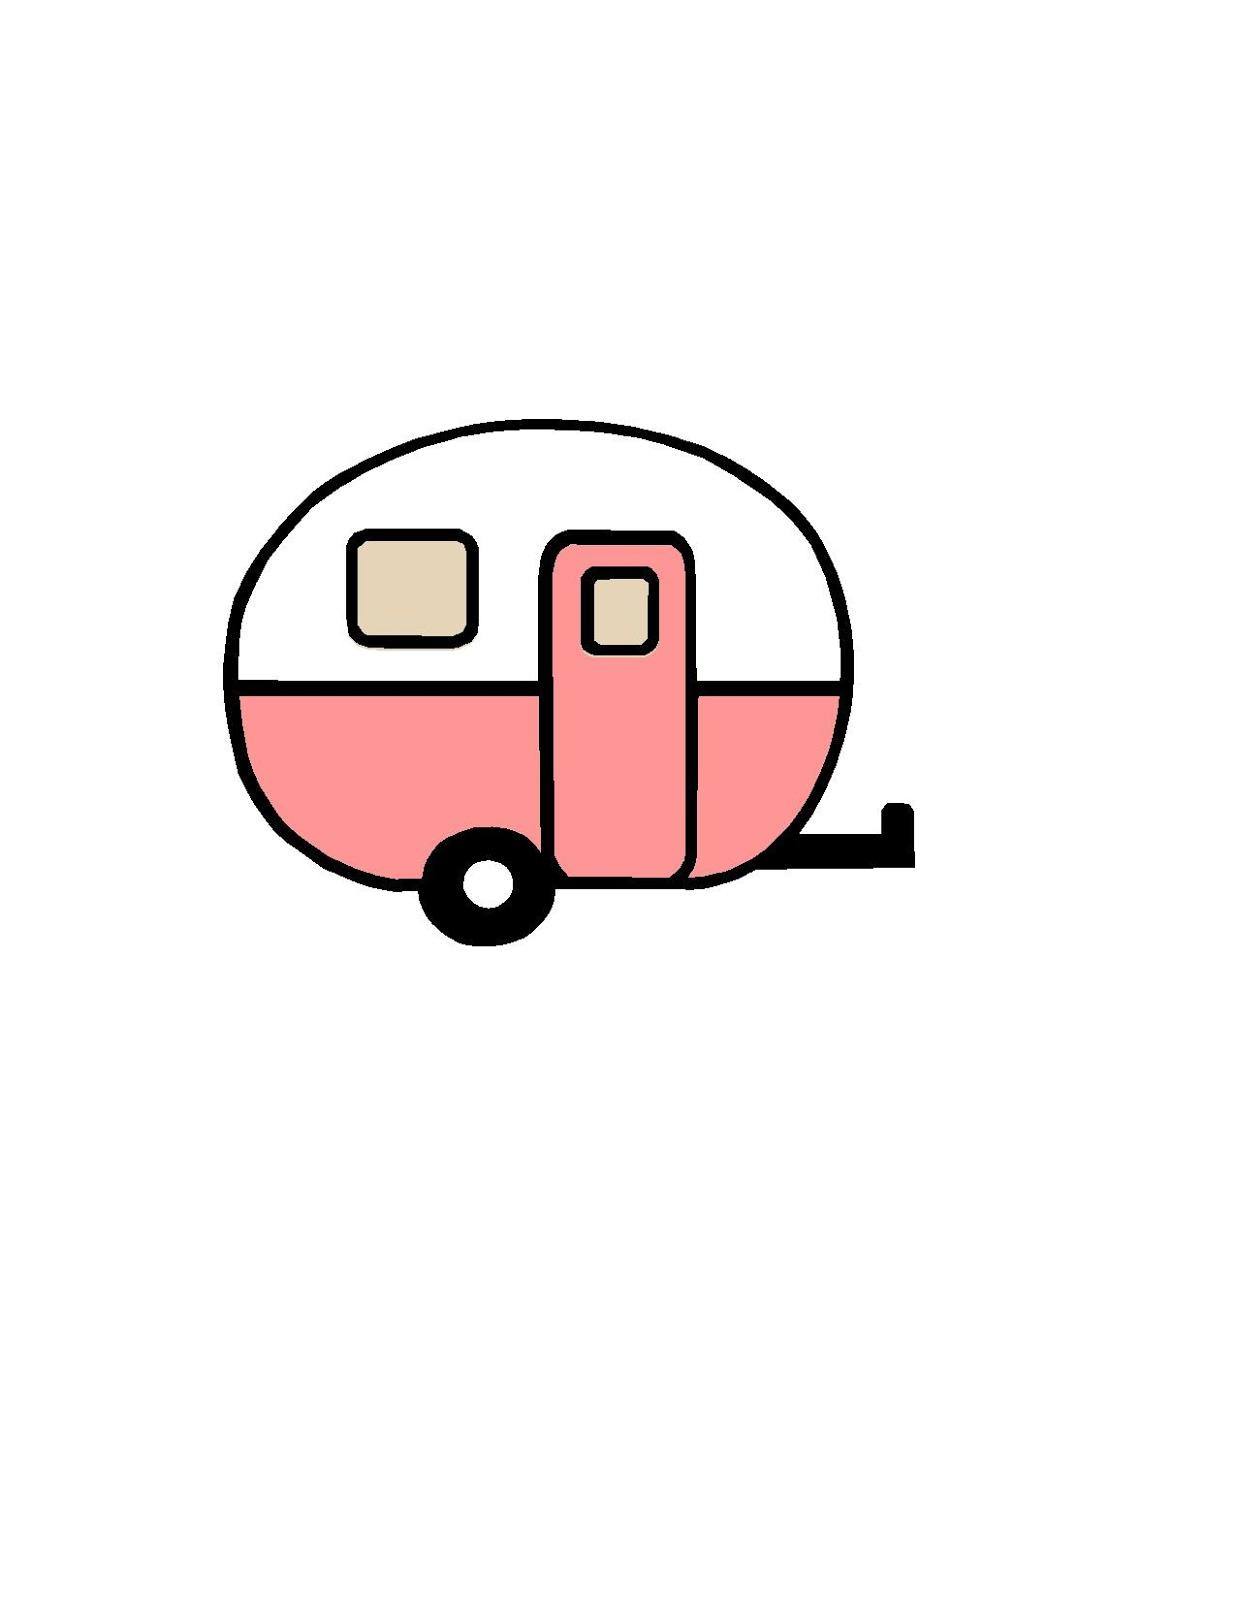 Closet Crafter: Free Vintage Camper Silhouette Design File